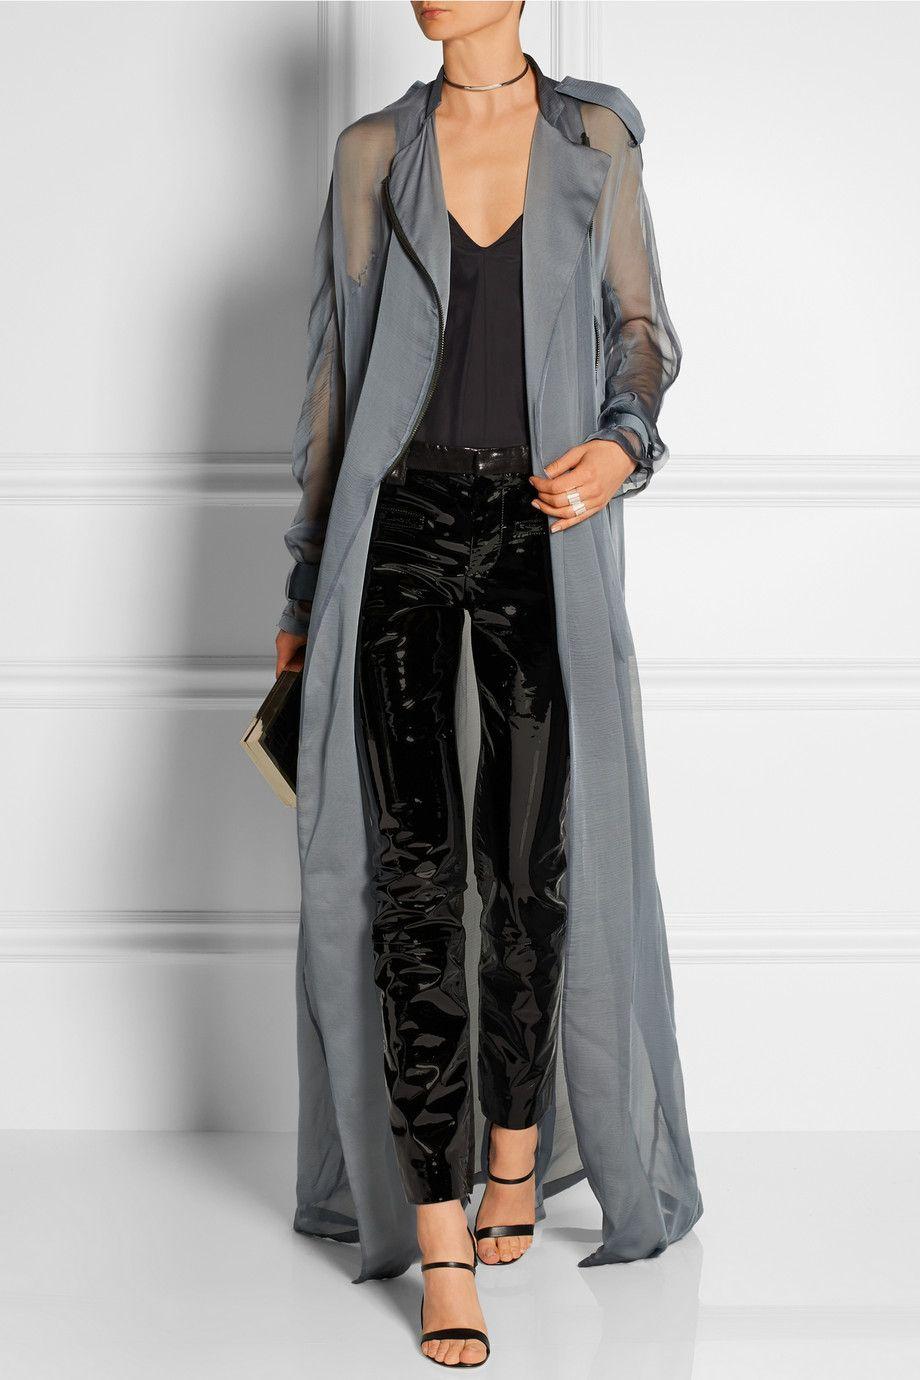 black-skinny-jeans-patent-leather-black-cami-choker-sheer-black-shoe-sandalh-maxi-blue-light-jacket-coat-trench-spring-summer-dinner.jpg